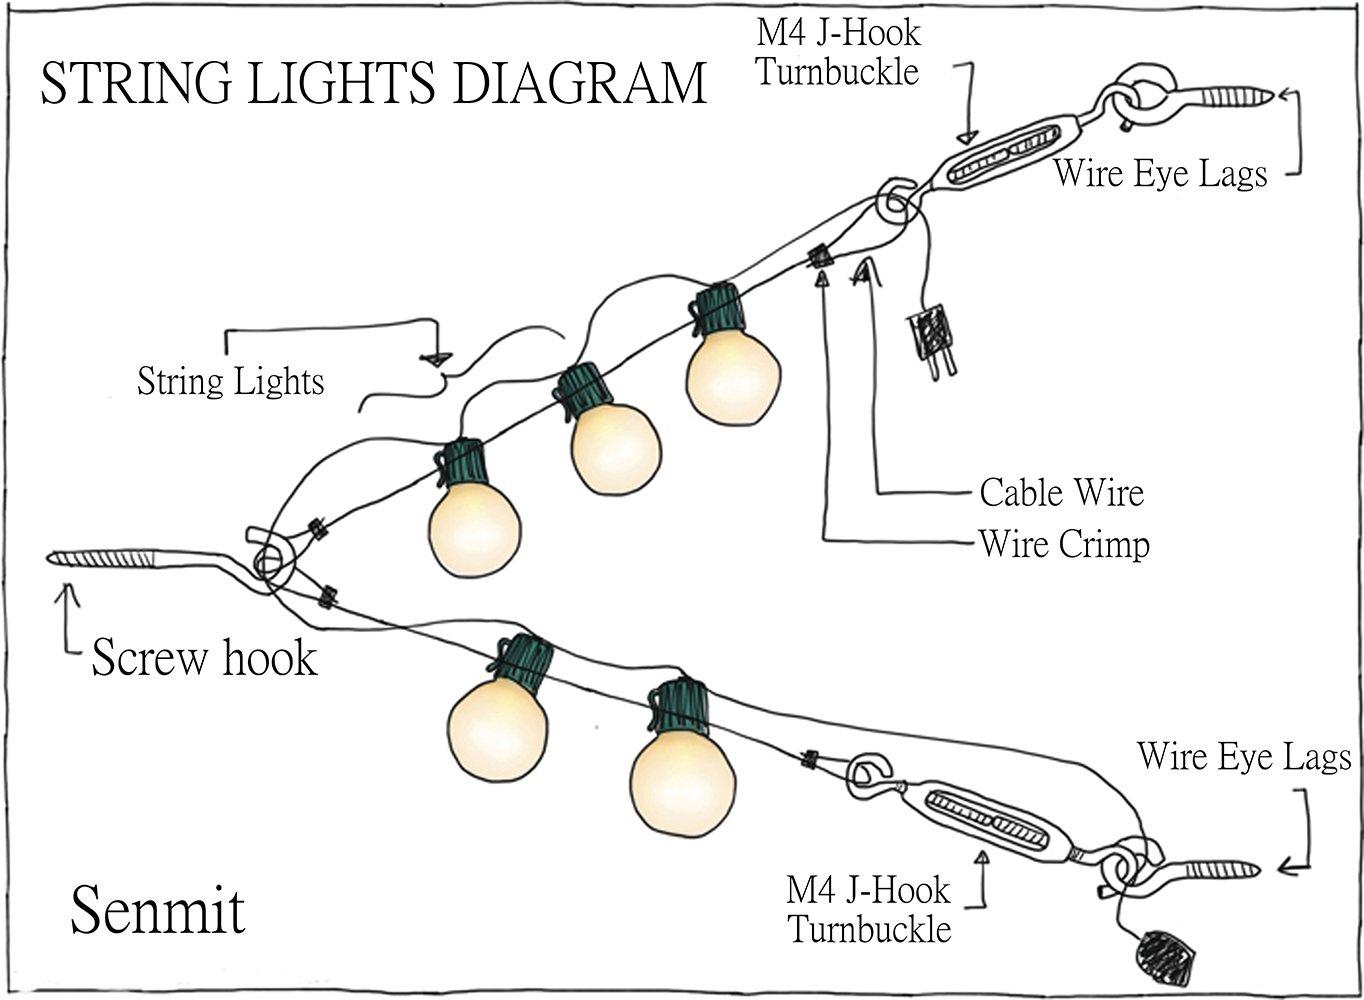 string wire 5 light wiring diagram wiring diagram